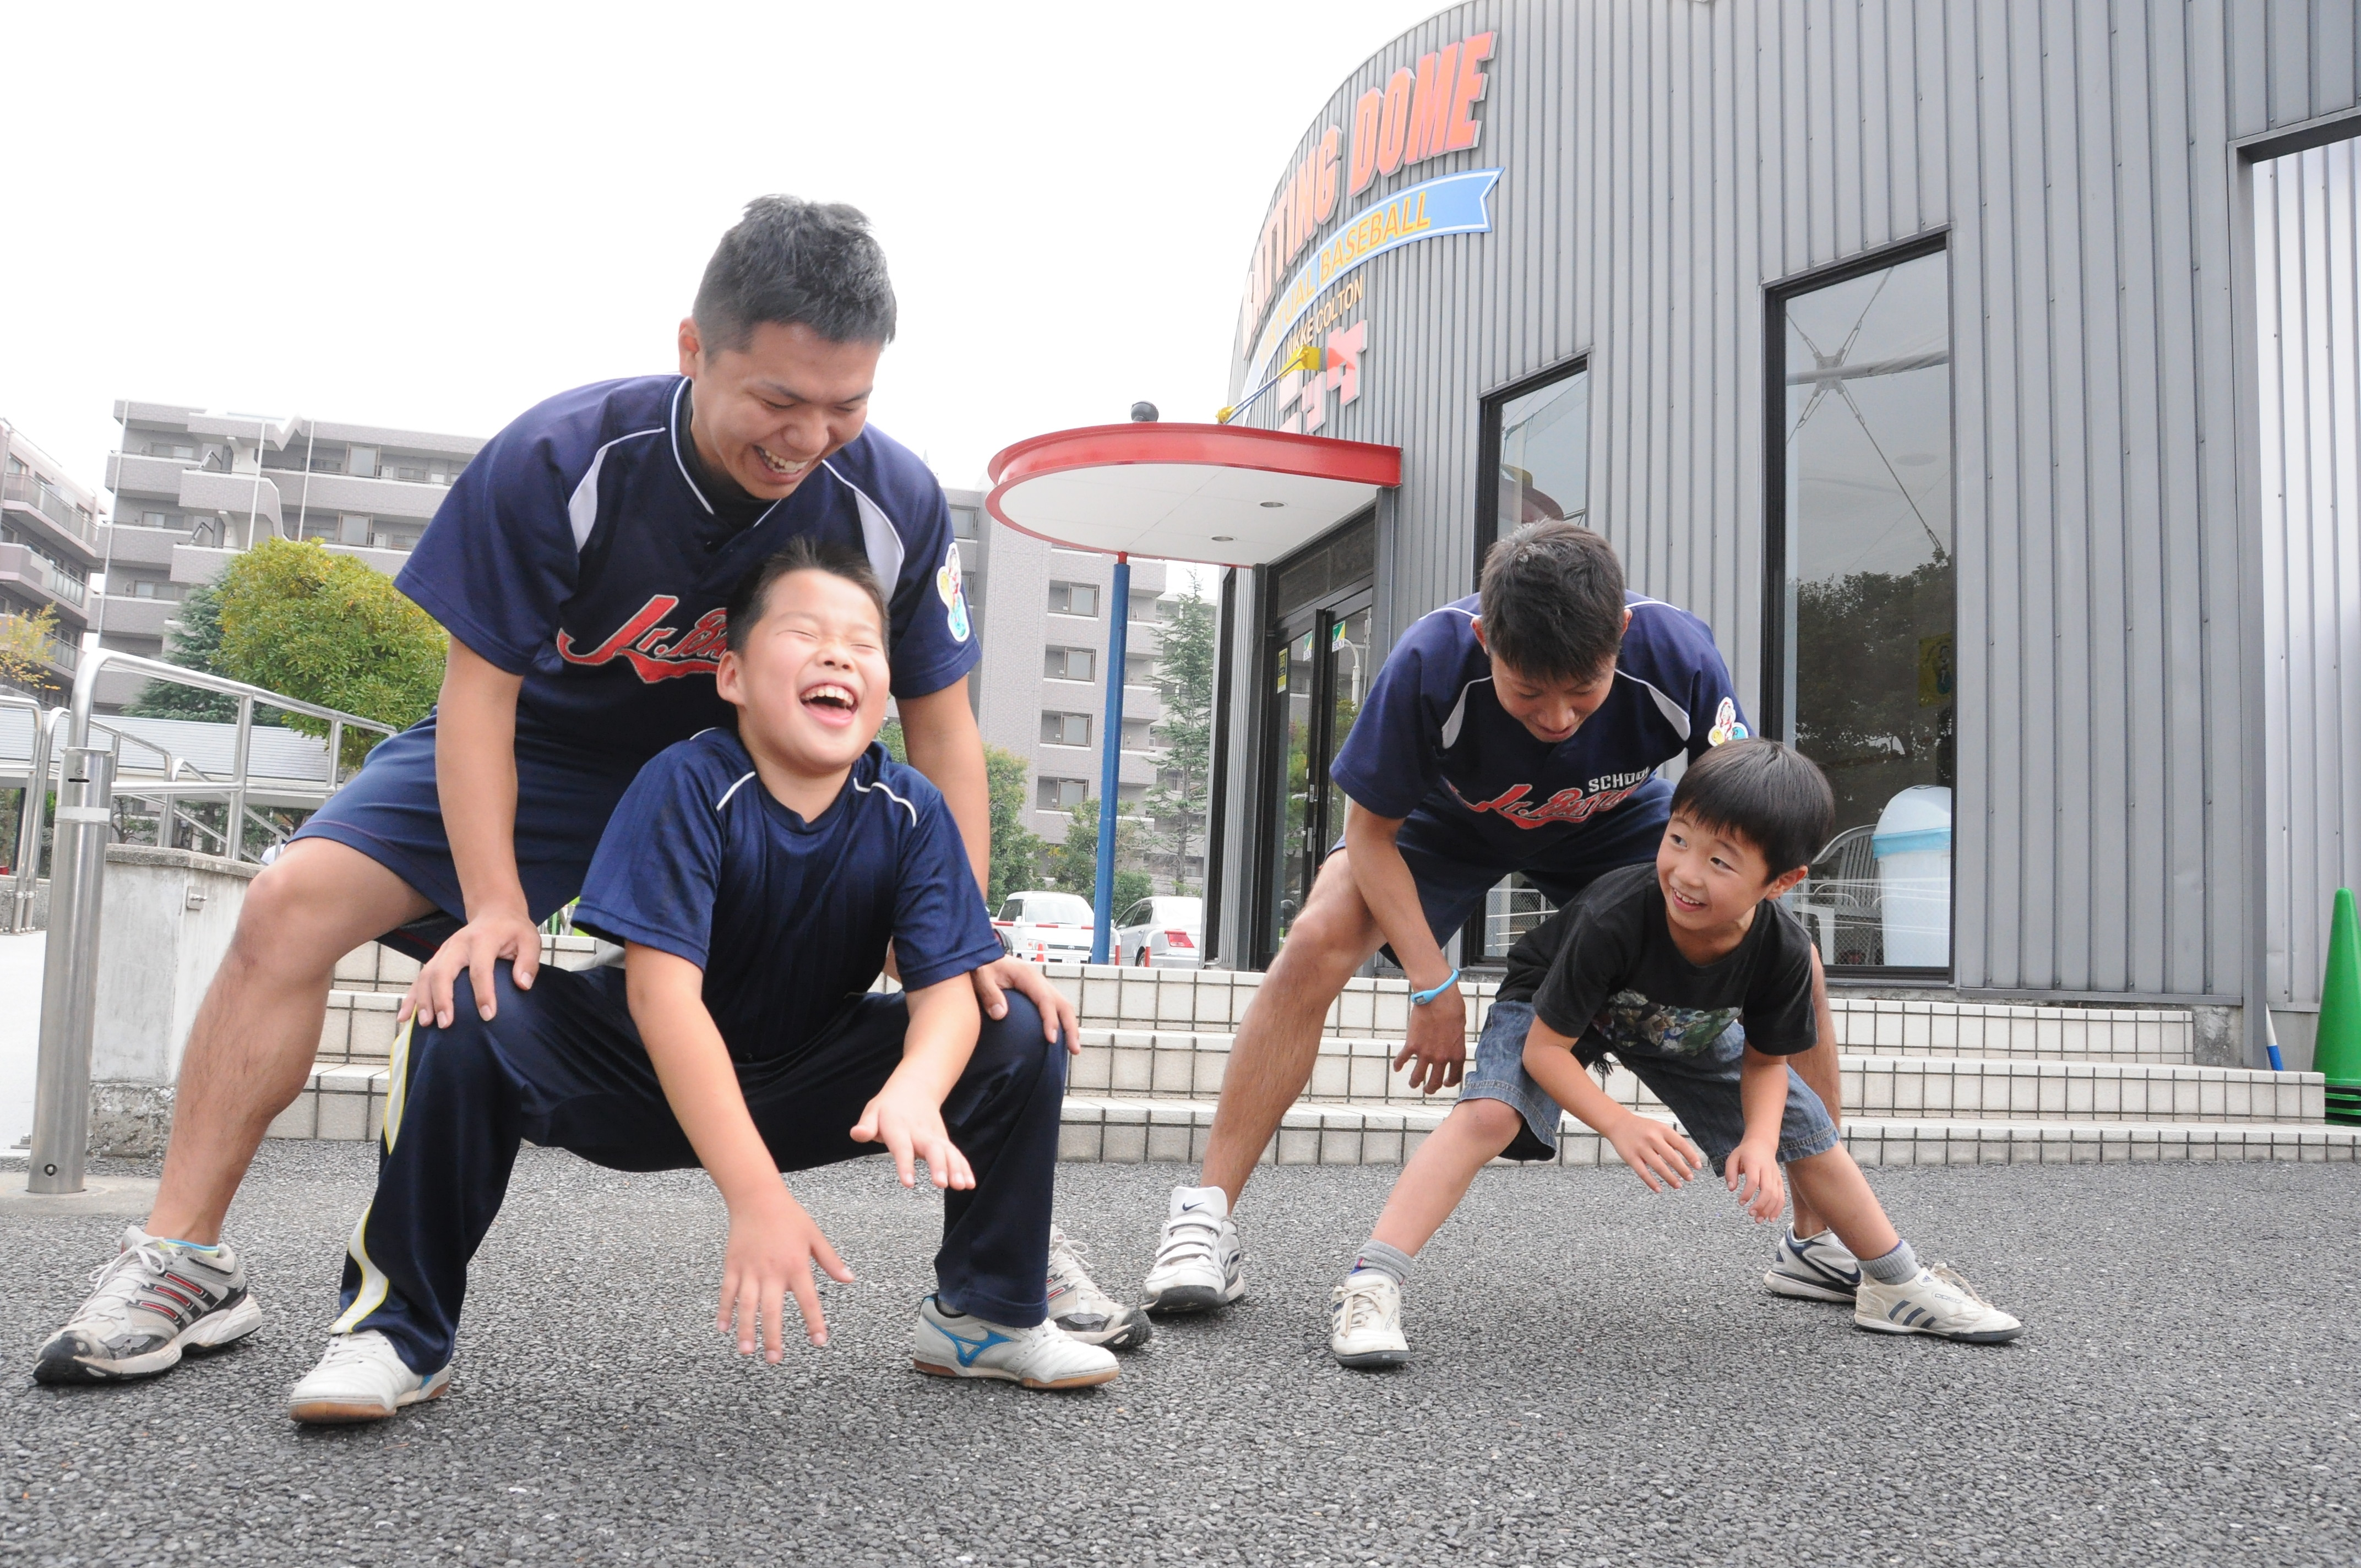 JBS(ジュニアバッティングスクール) 羽村ドーム校 のアルバイト情報